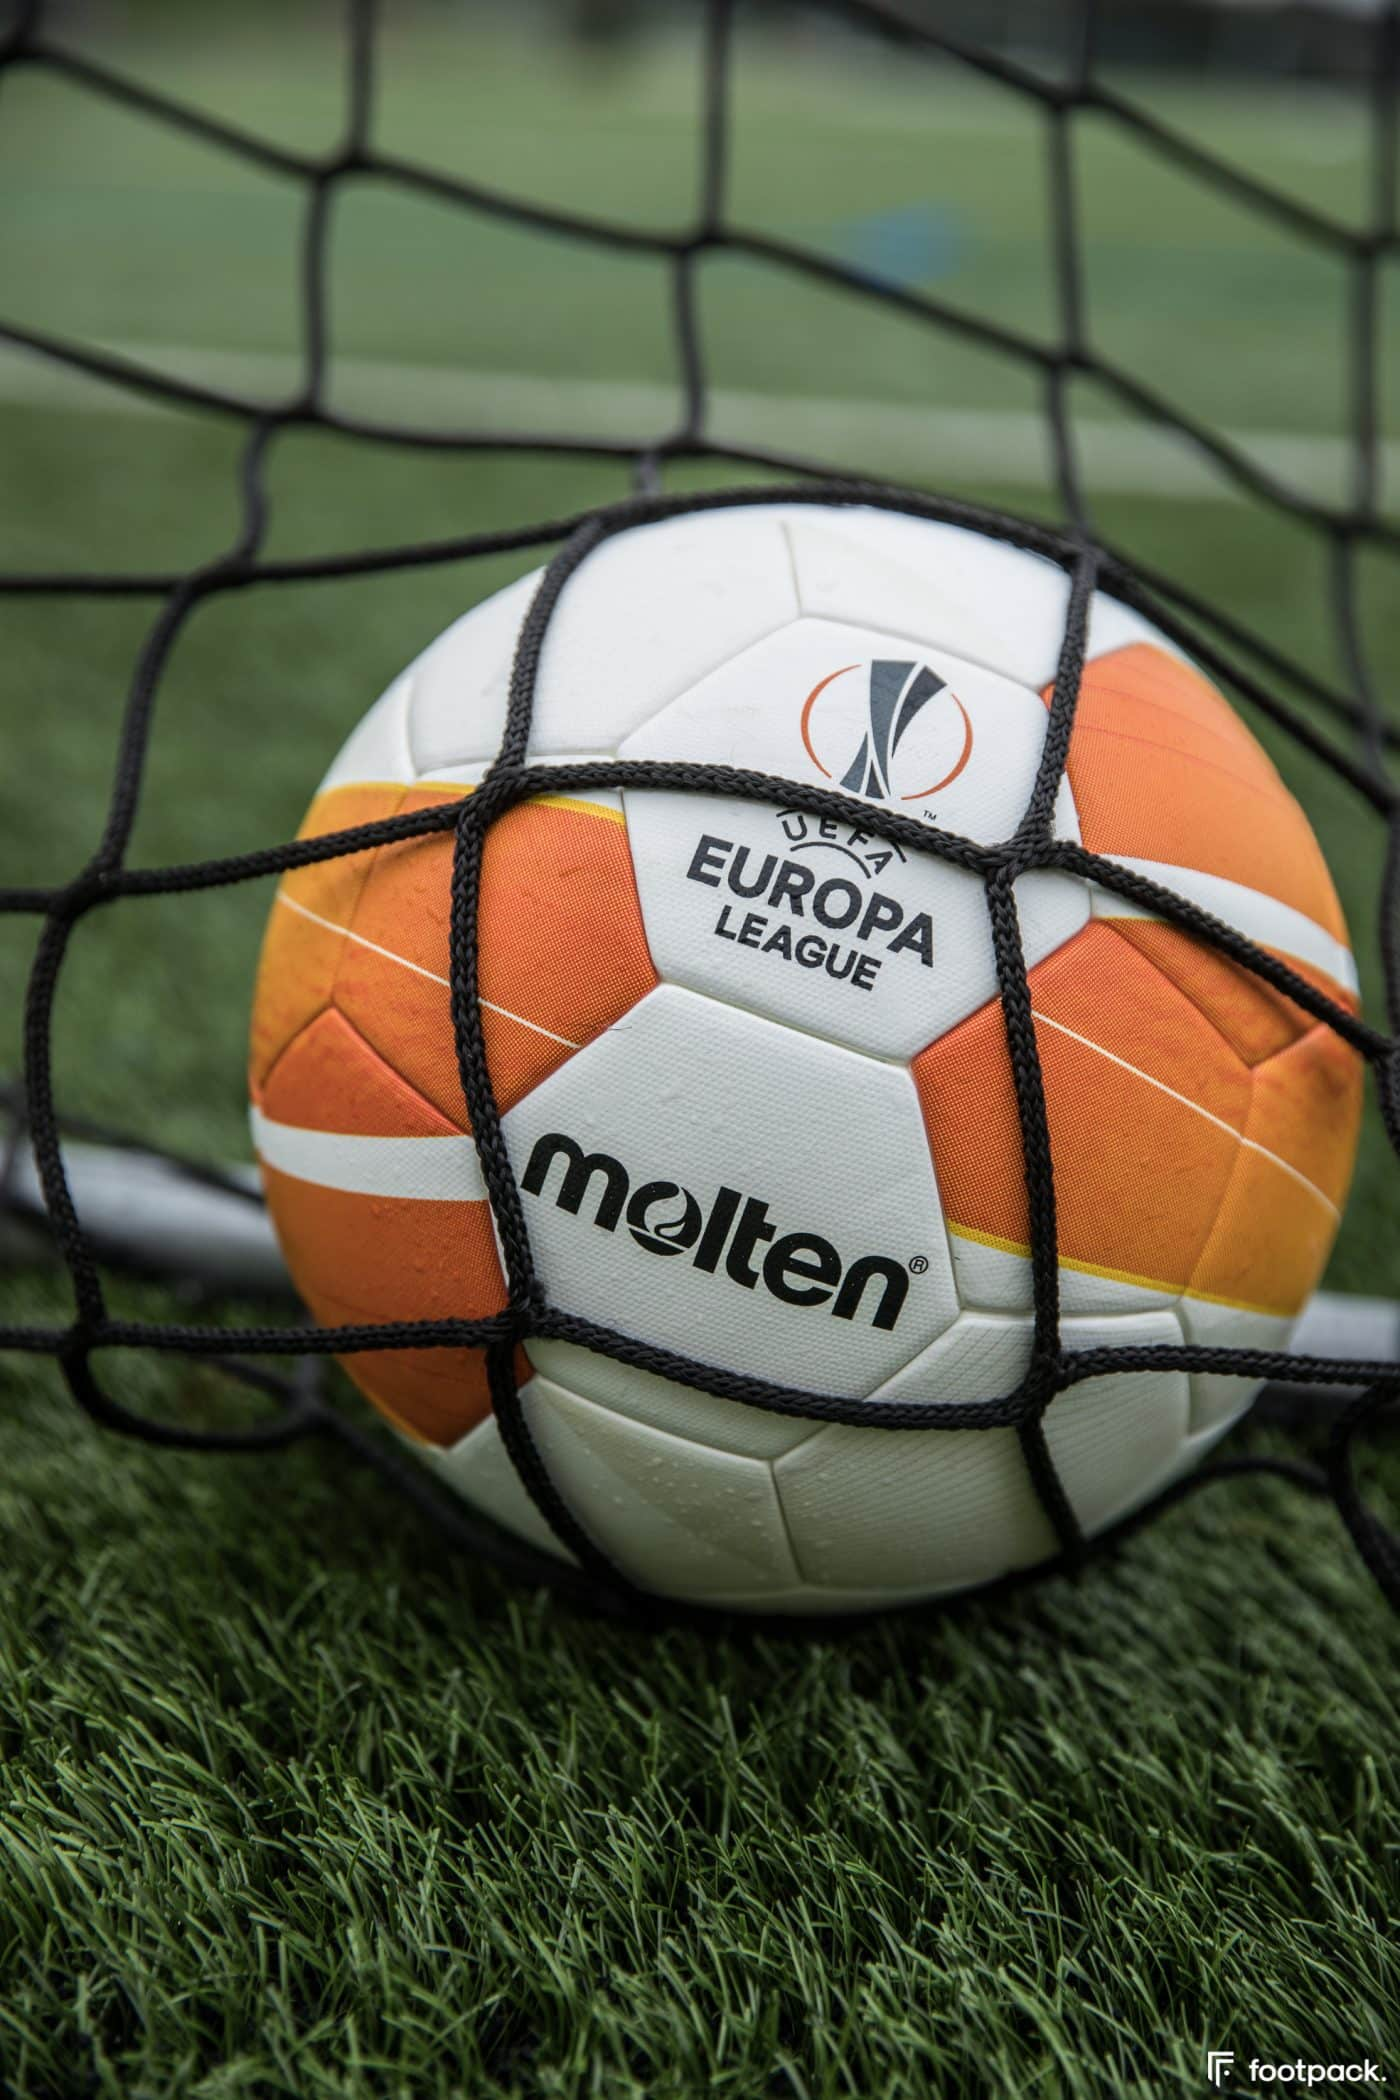 ballon-europa-league-2020-2021-footpack-6